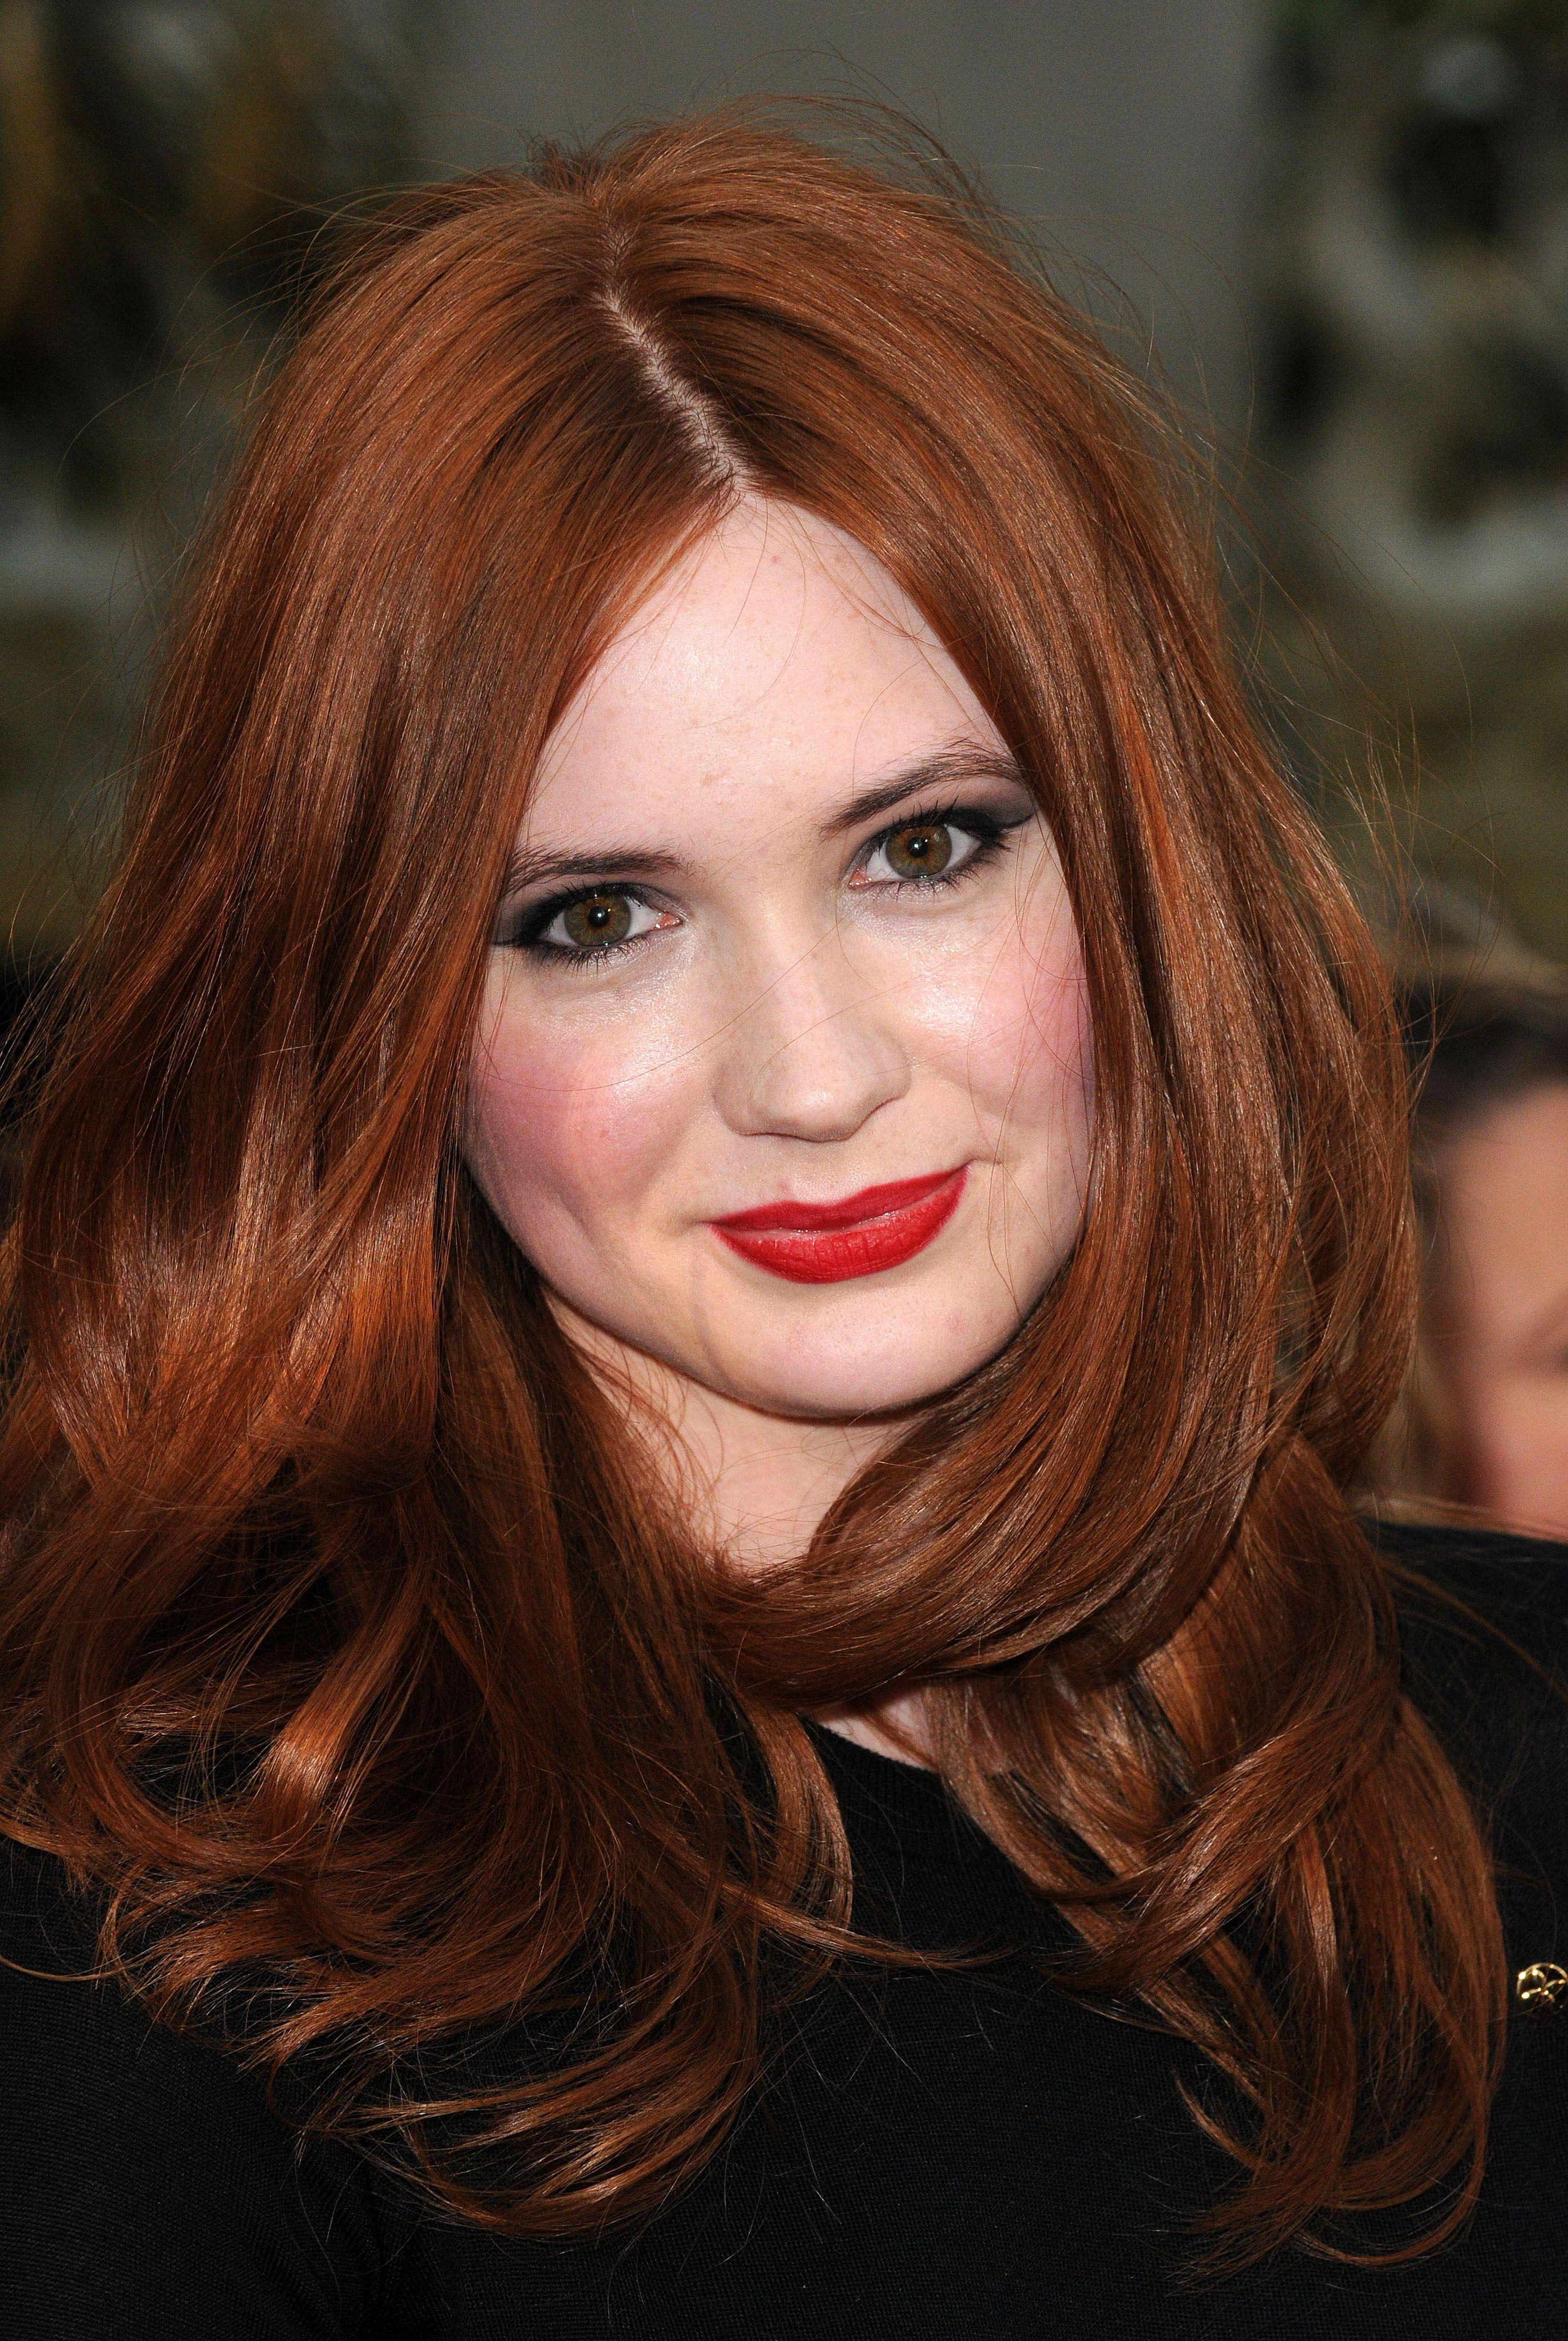 british-redhead-actress-girls-doing-sexy-things